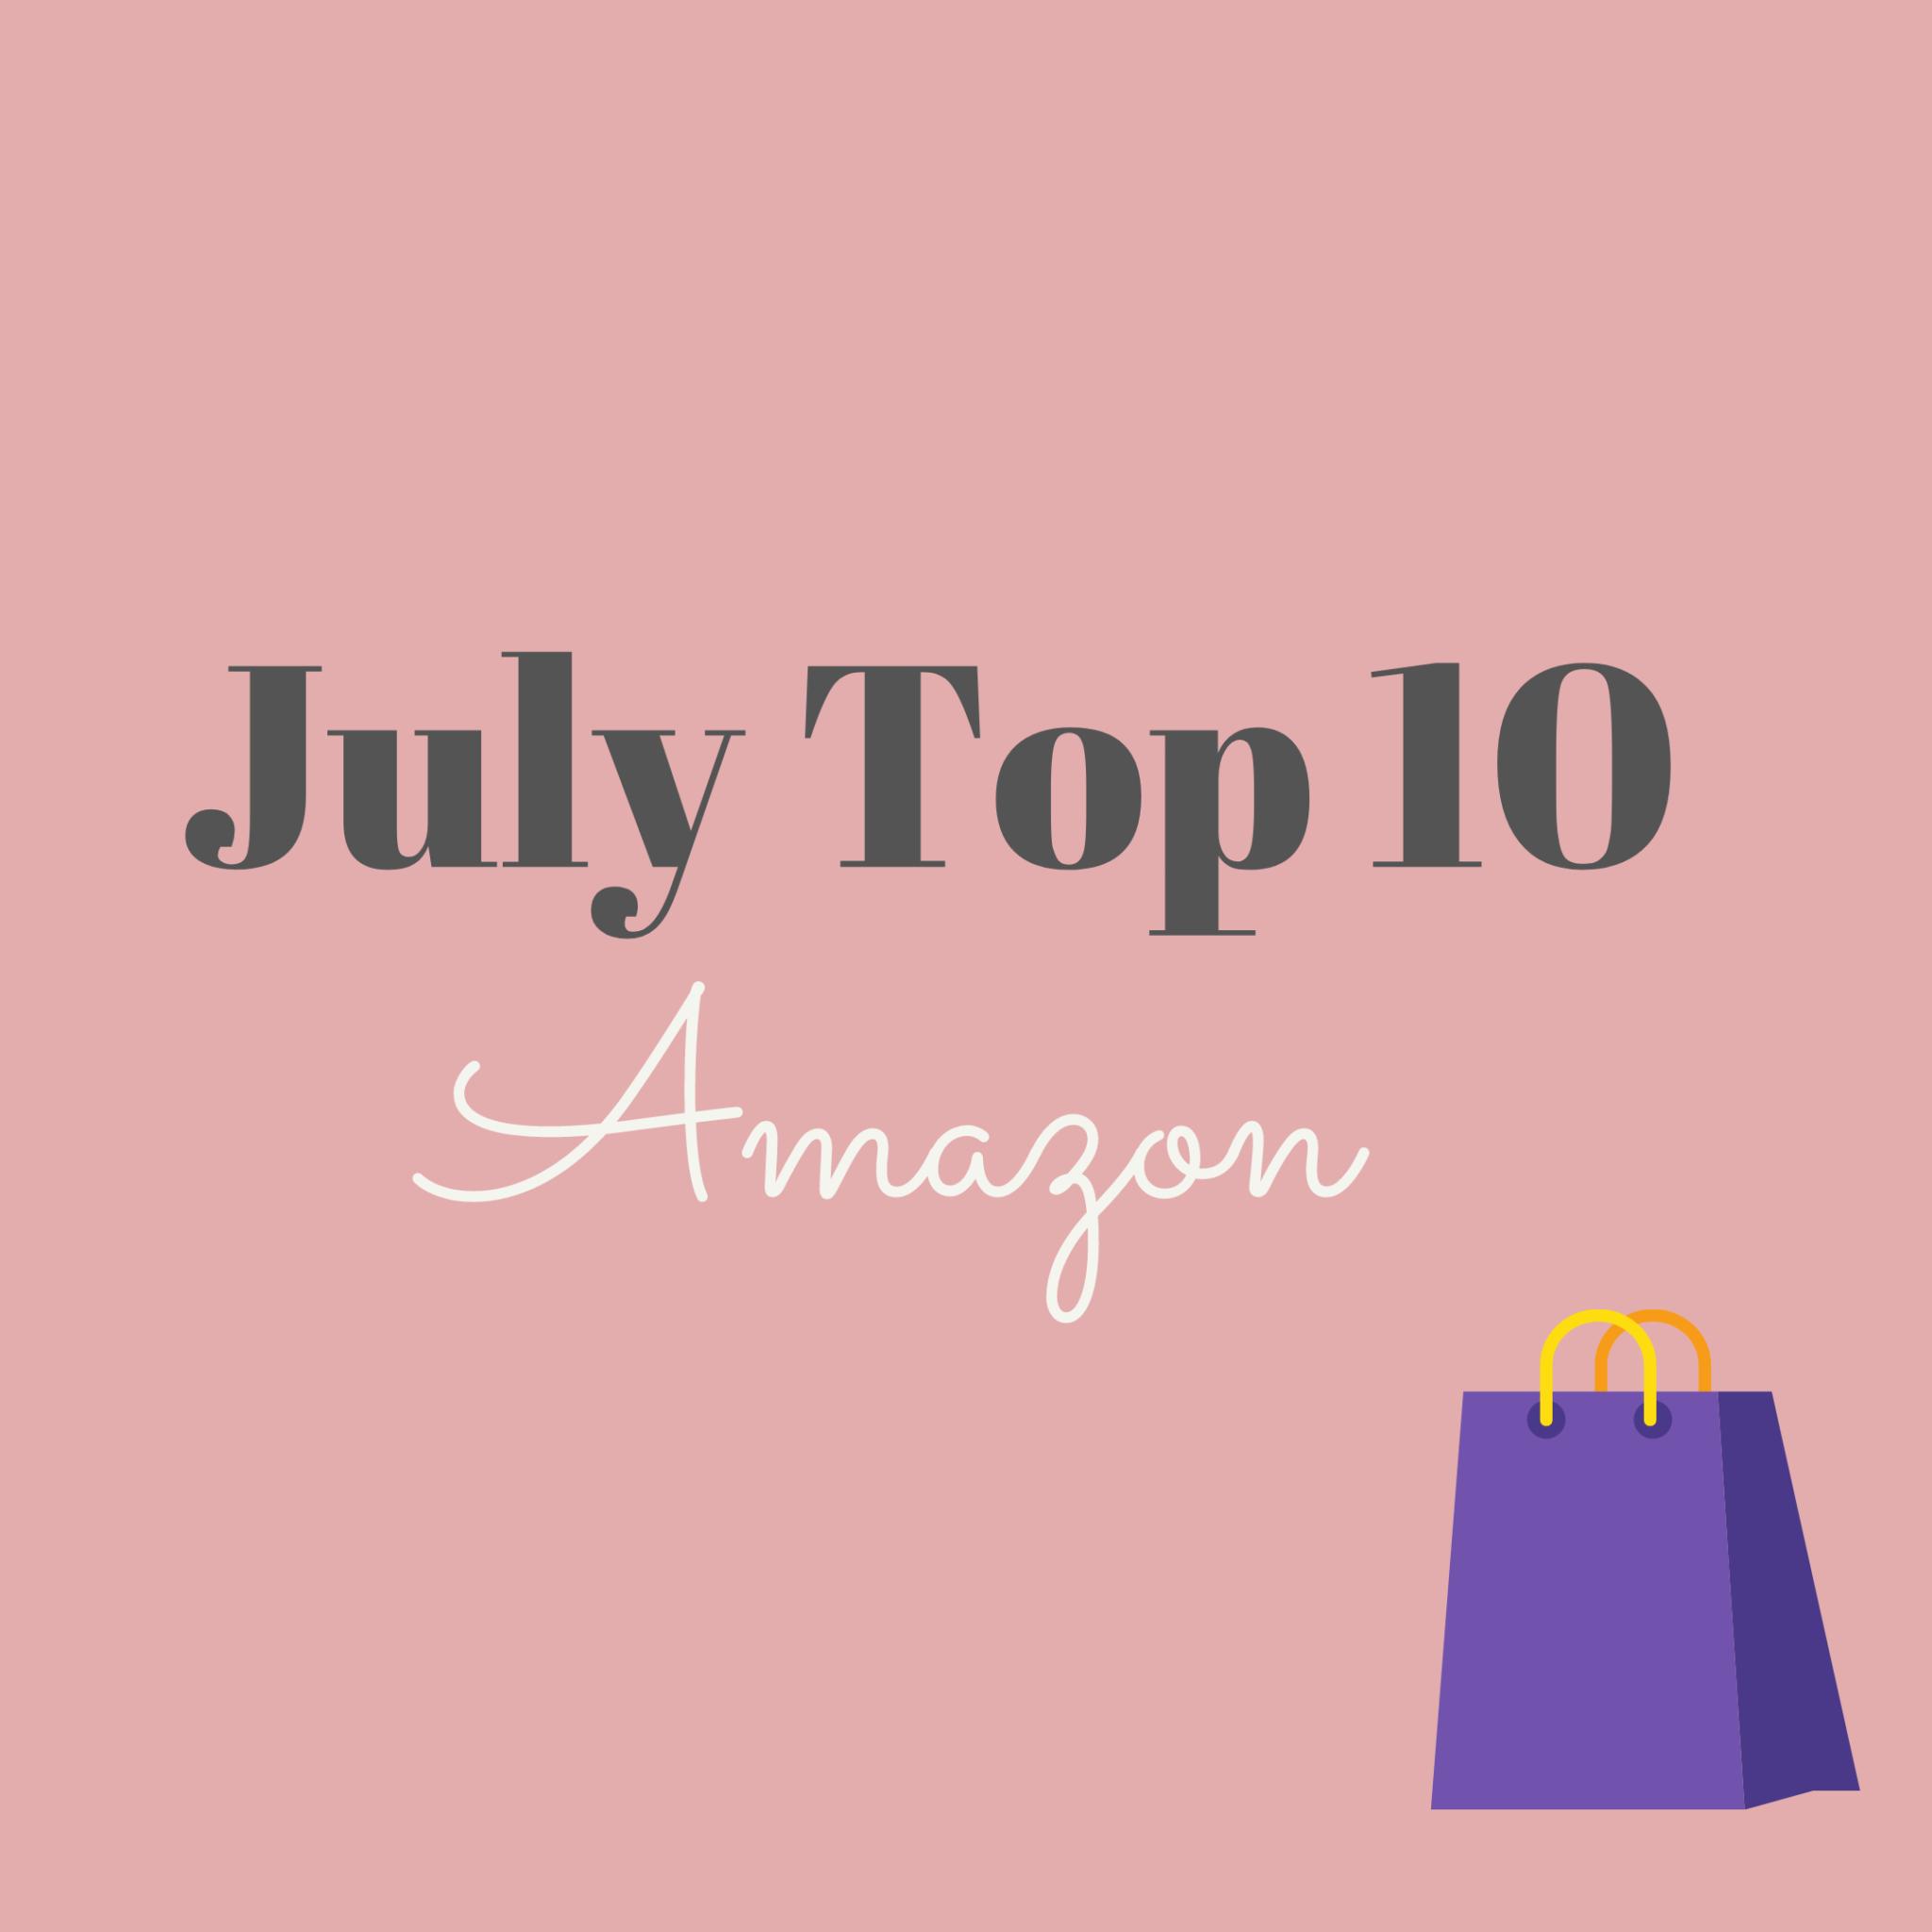 July Top 10